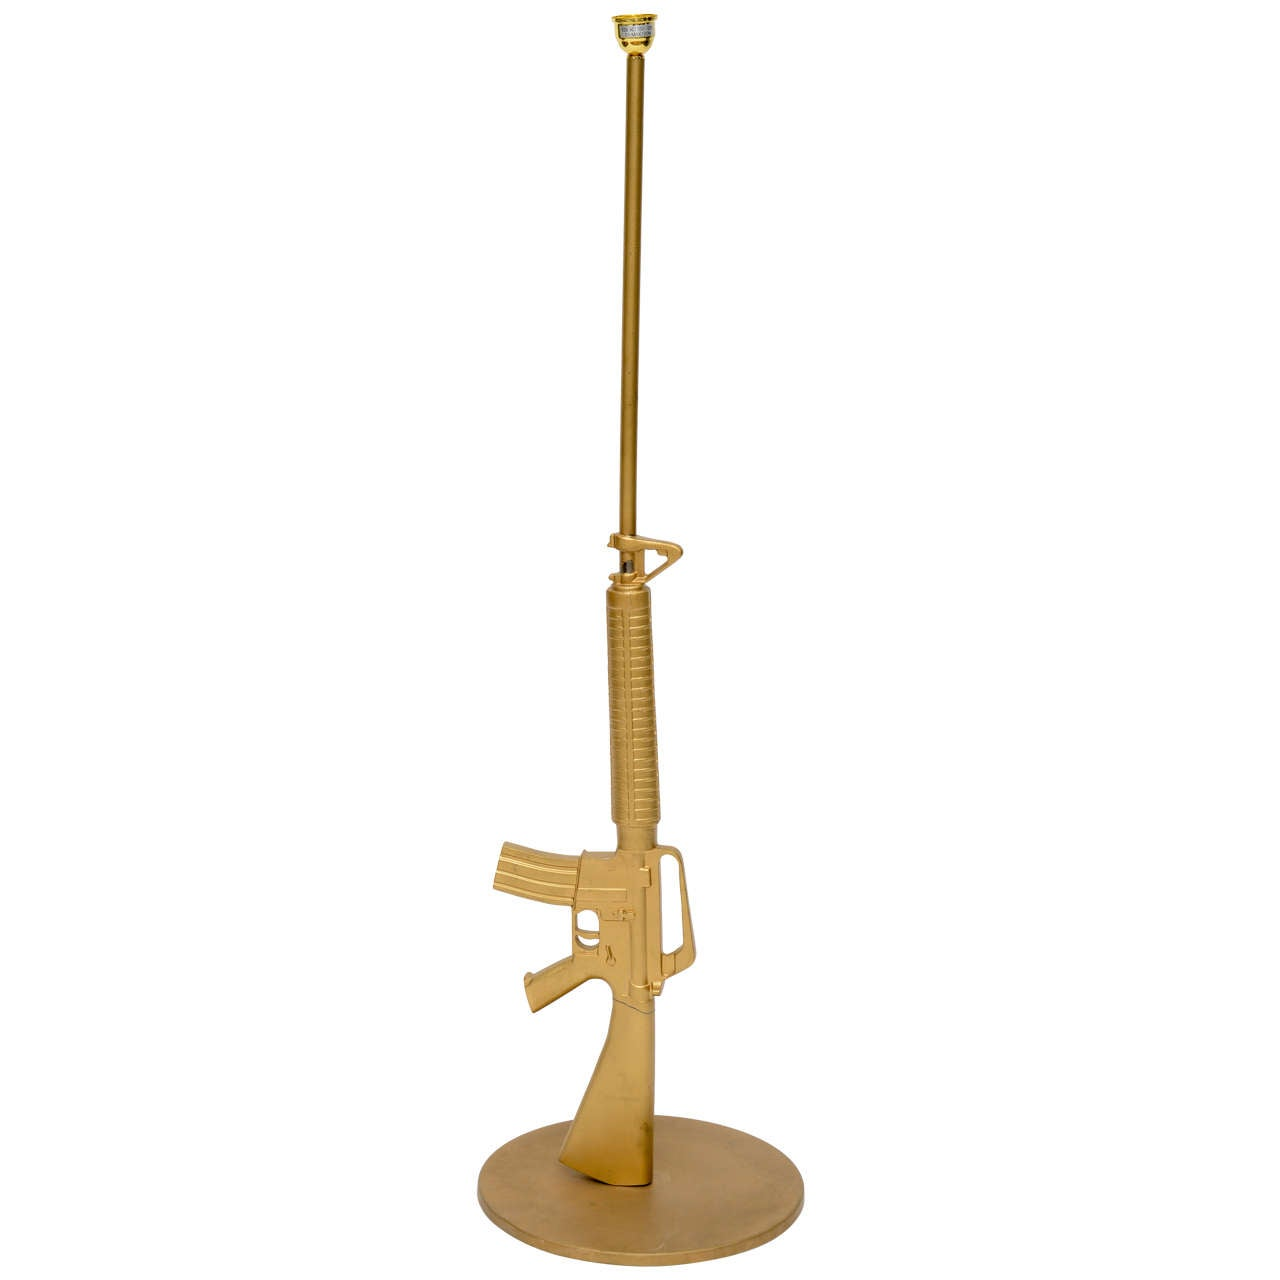 philippe starck machine gun lamp 20th century at 1stdibs. Black Bedroom Furniture Sets. Home Design Ideas